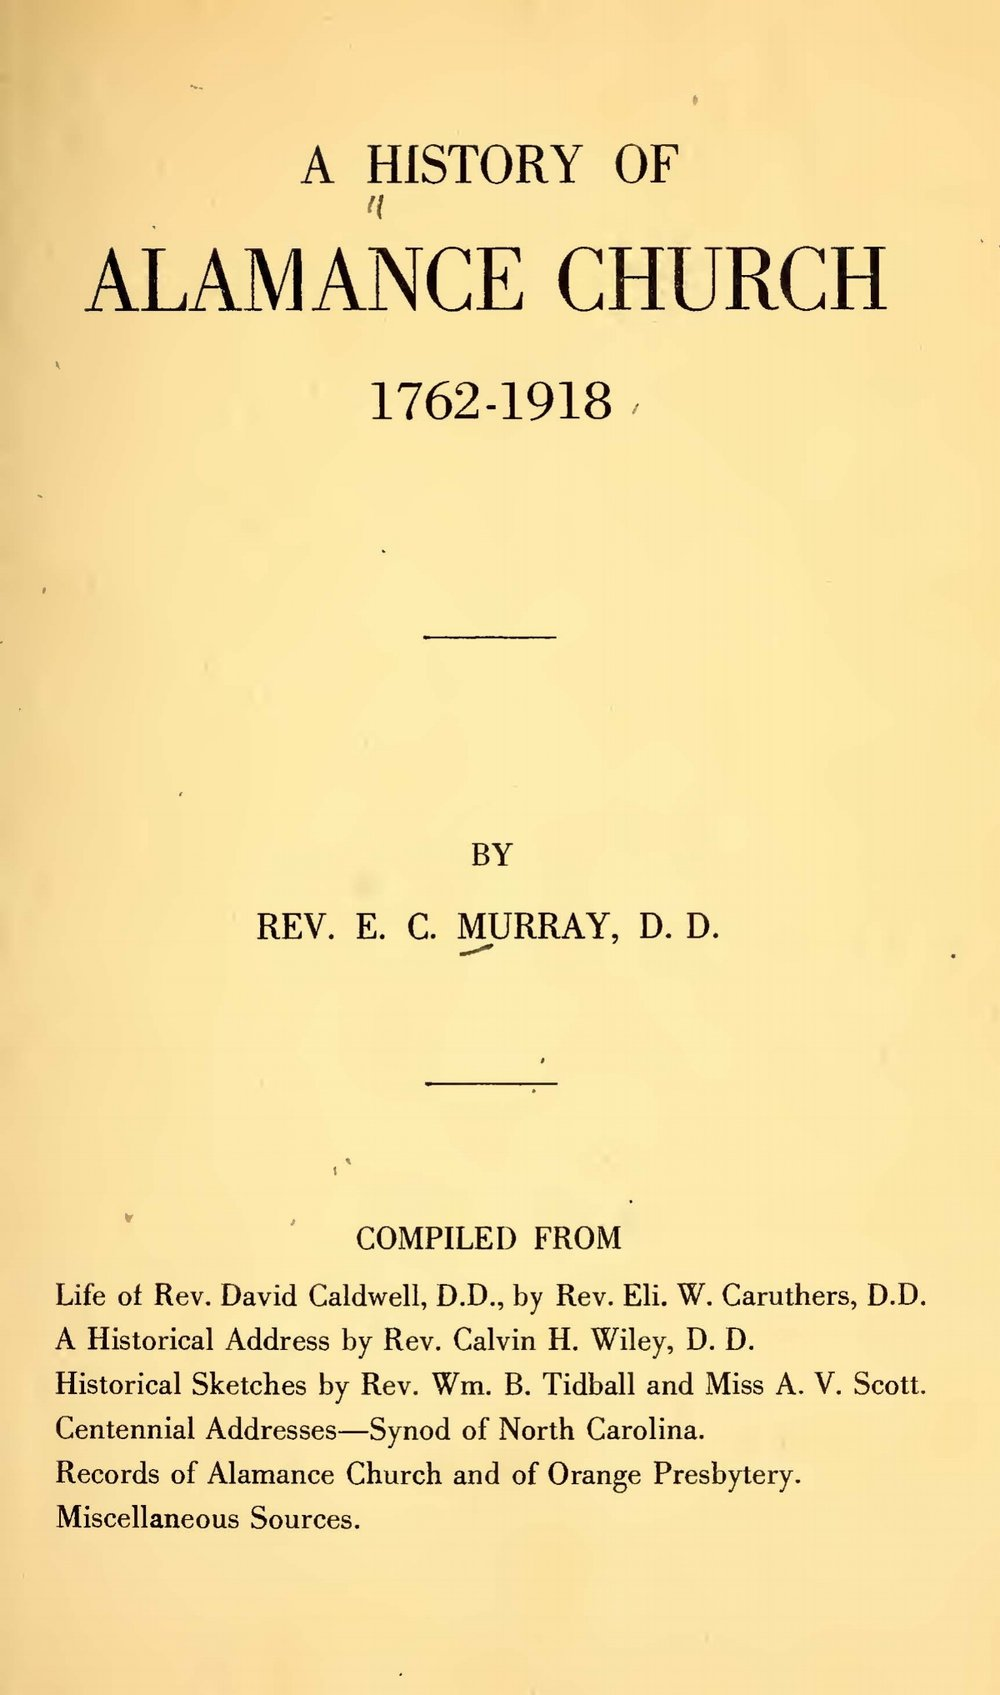 Murray, Ephraim C., A History of Alamance Church, 1762-1918 Title Page.jpg